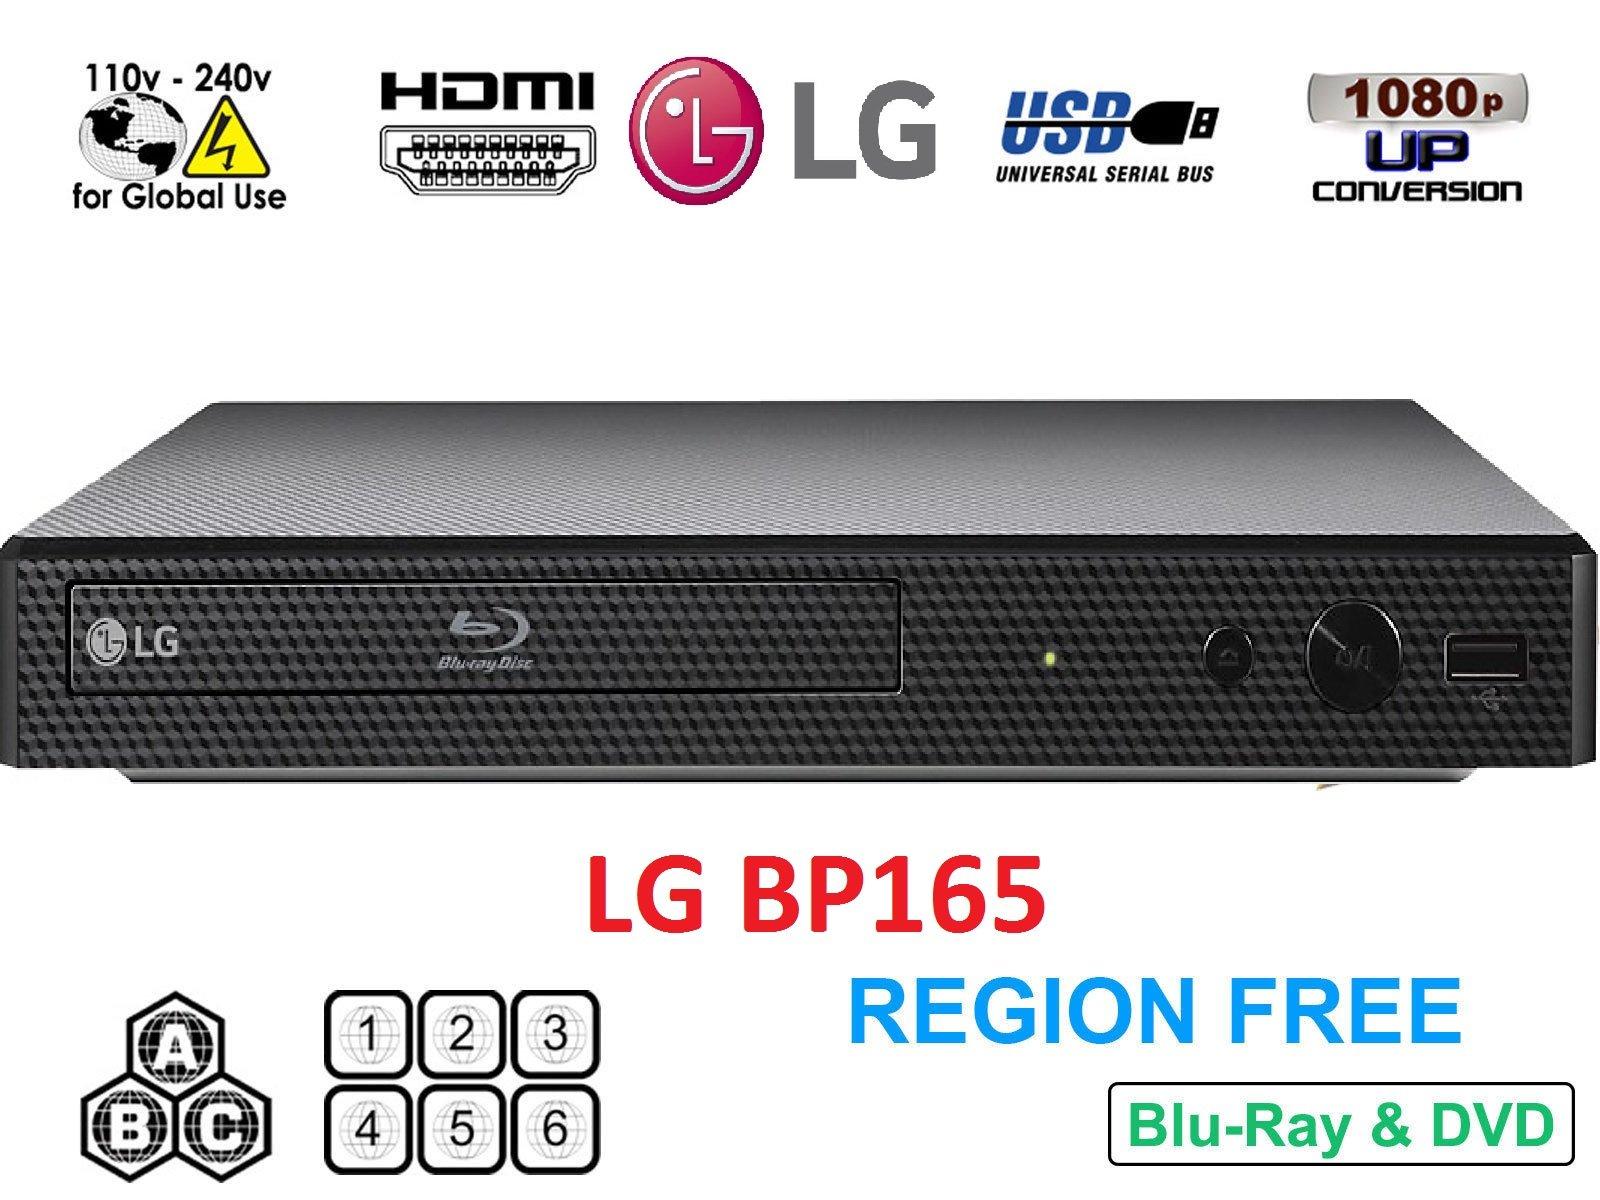 LG BP165 Region Free Blu-ray Player, Multi region 110-240 volts, 6FT HDMI cable & Dynastar Plug adapter bundle Package